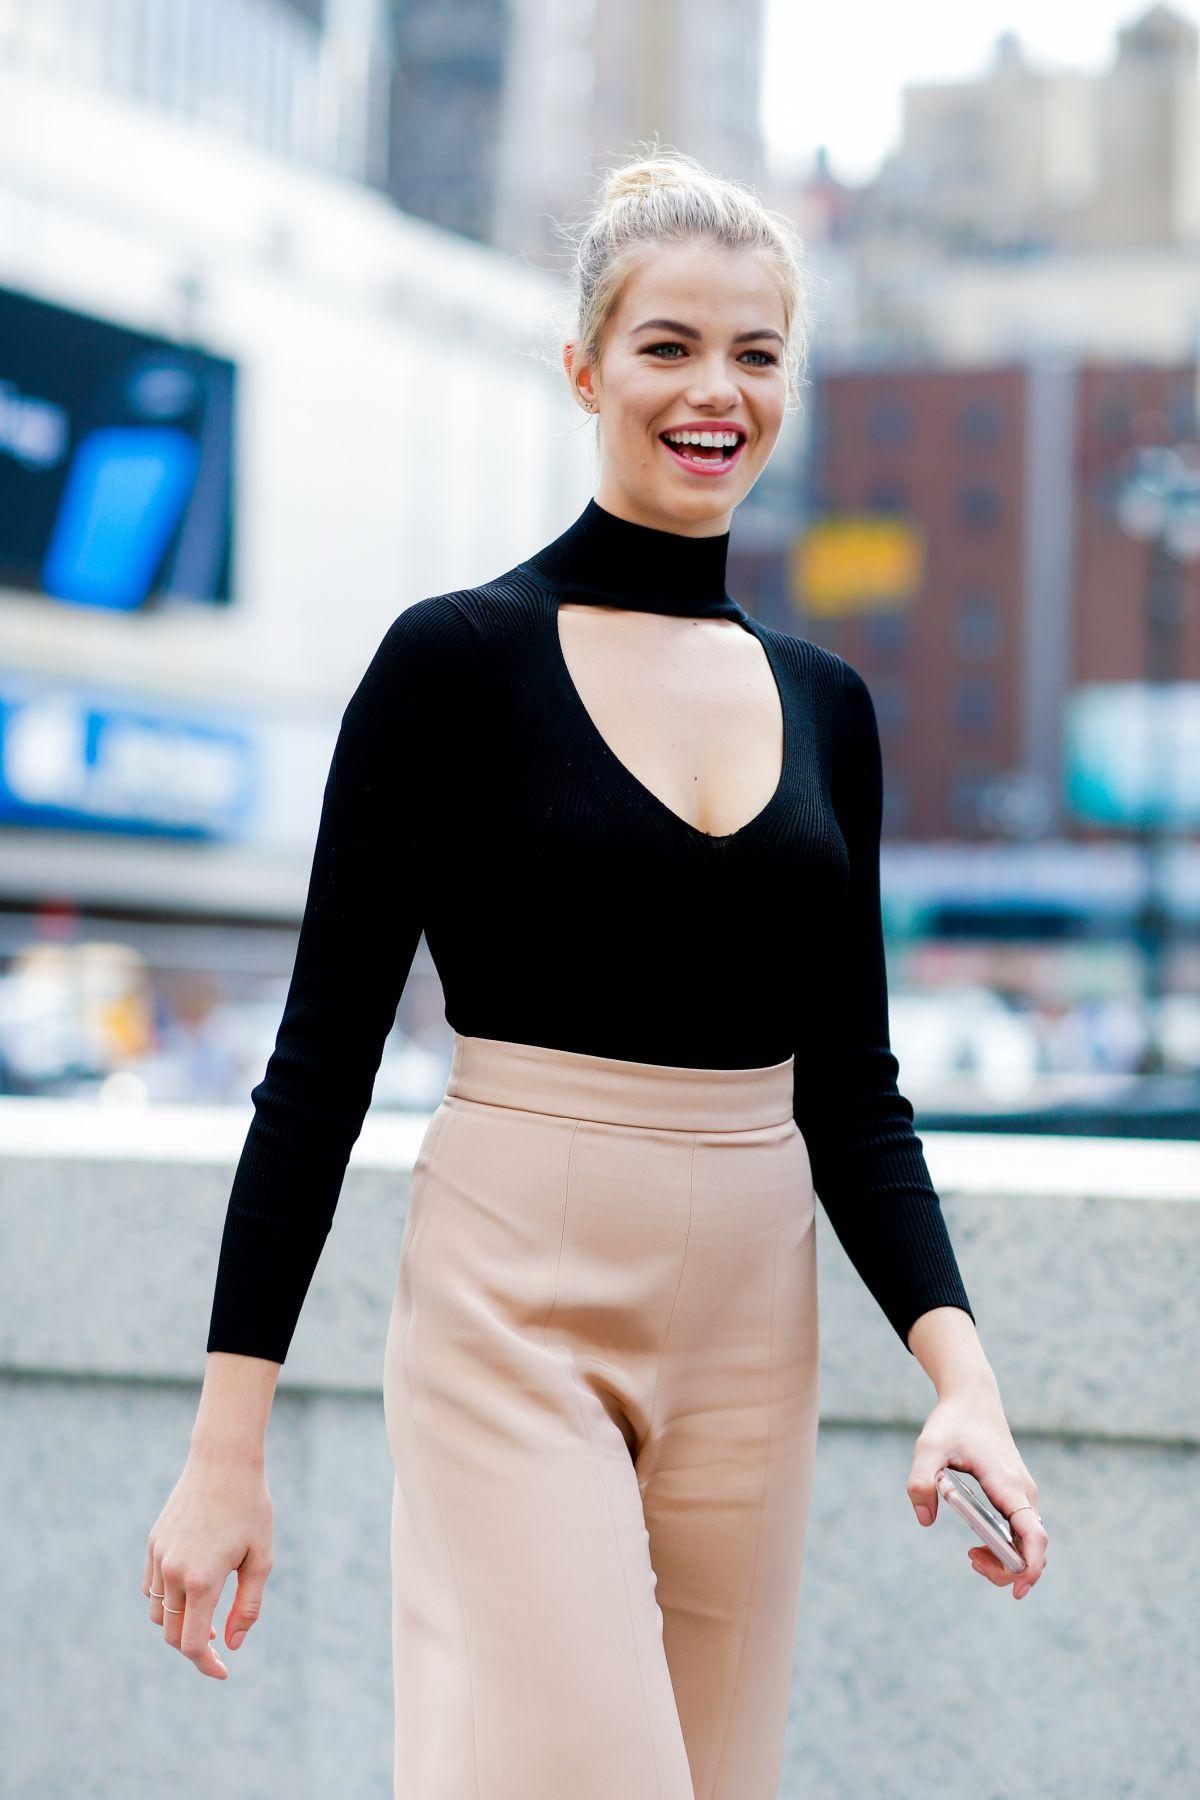 HAILEY CLAUSON at Cushnie et Ochs Fashion Show at New York Fashion Week 09/09/2016